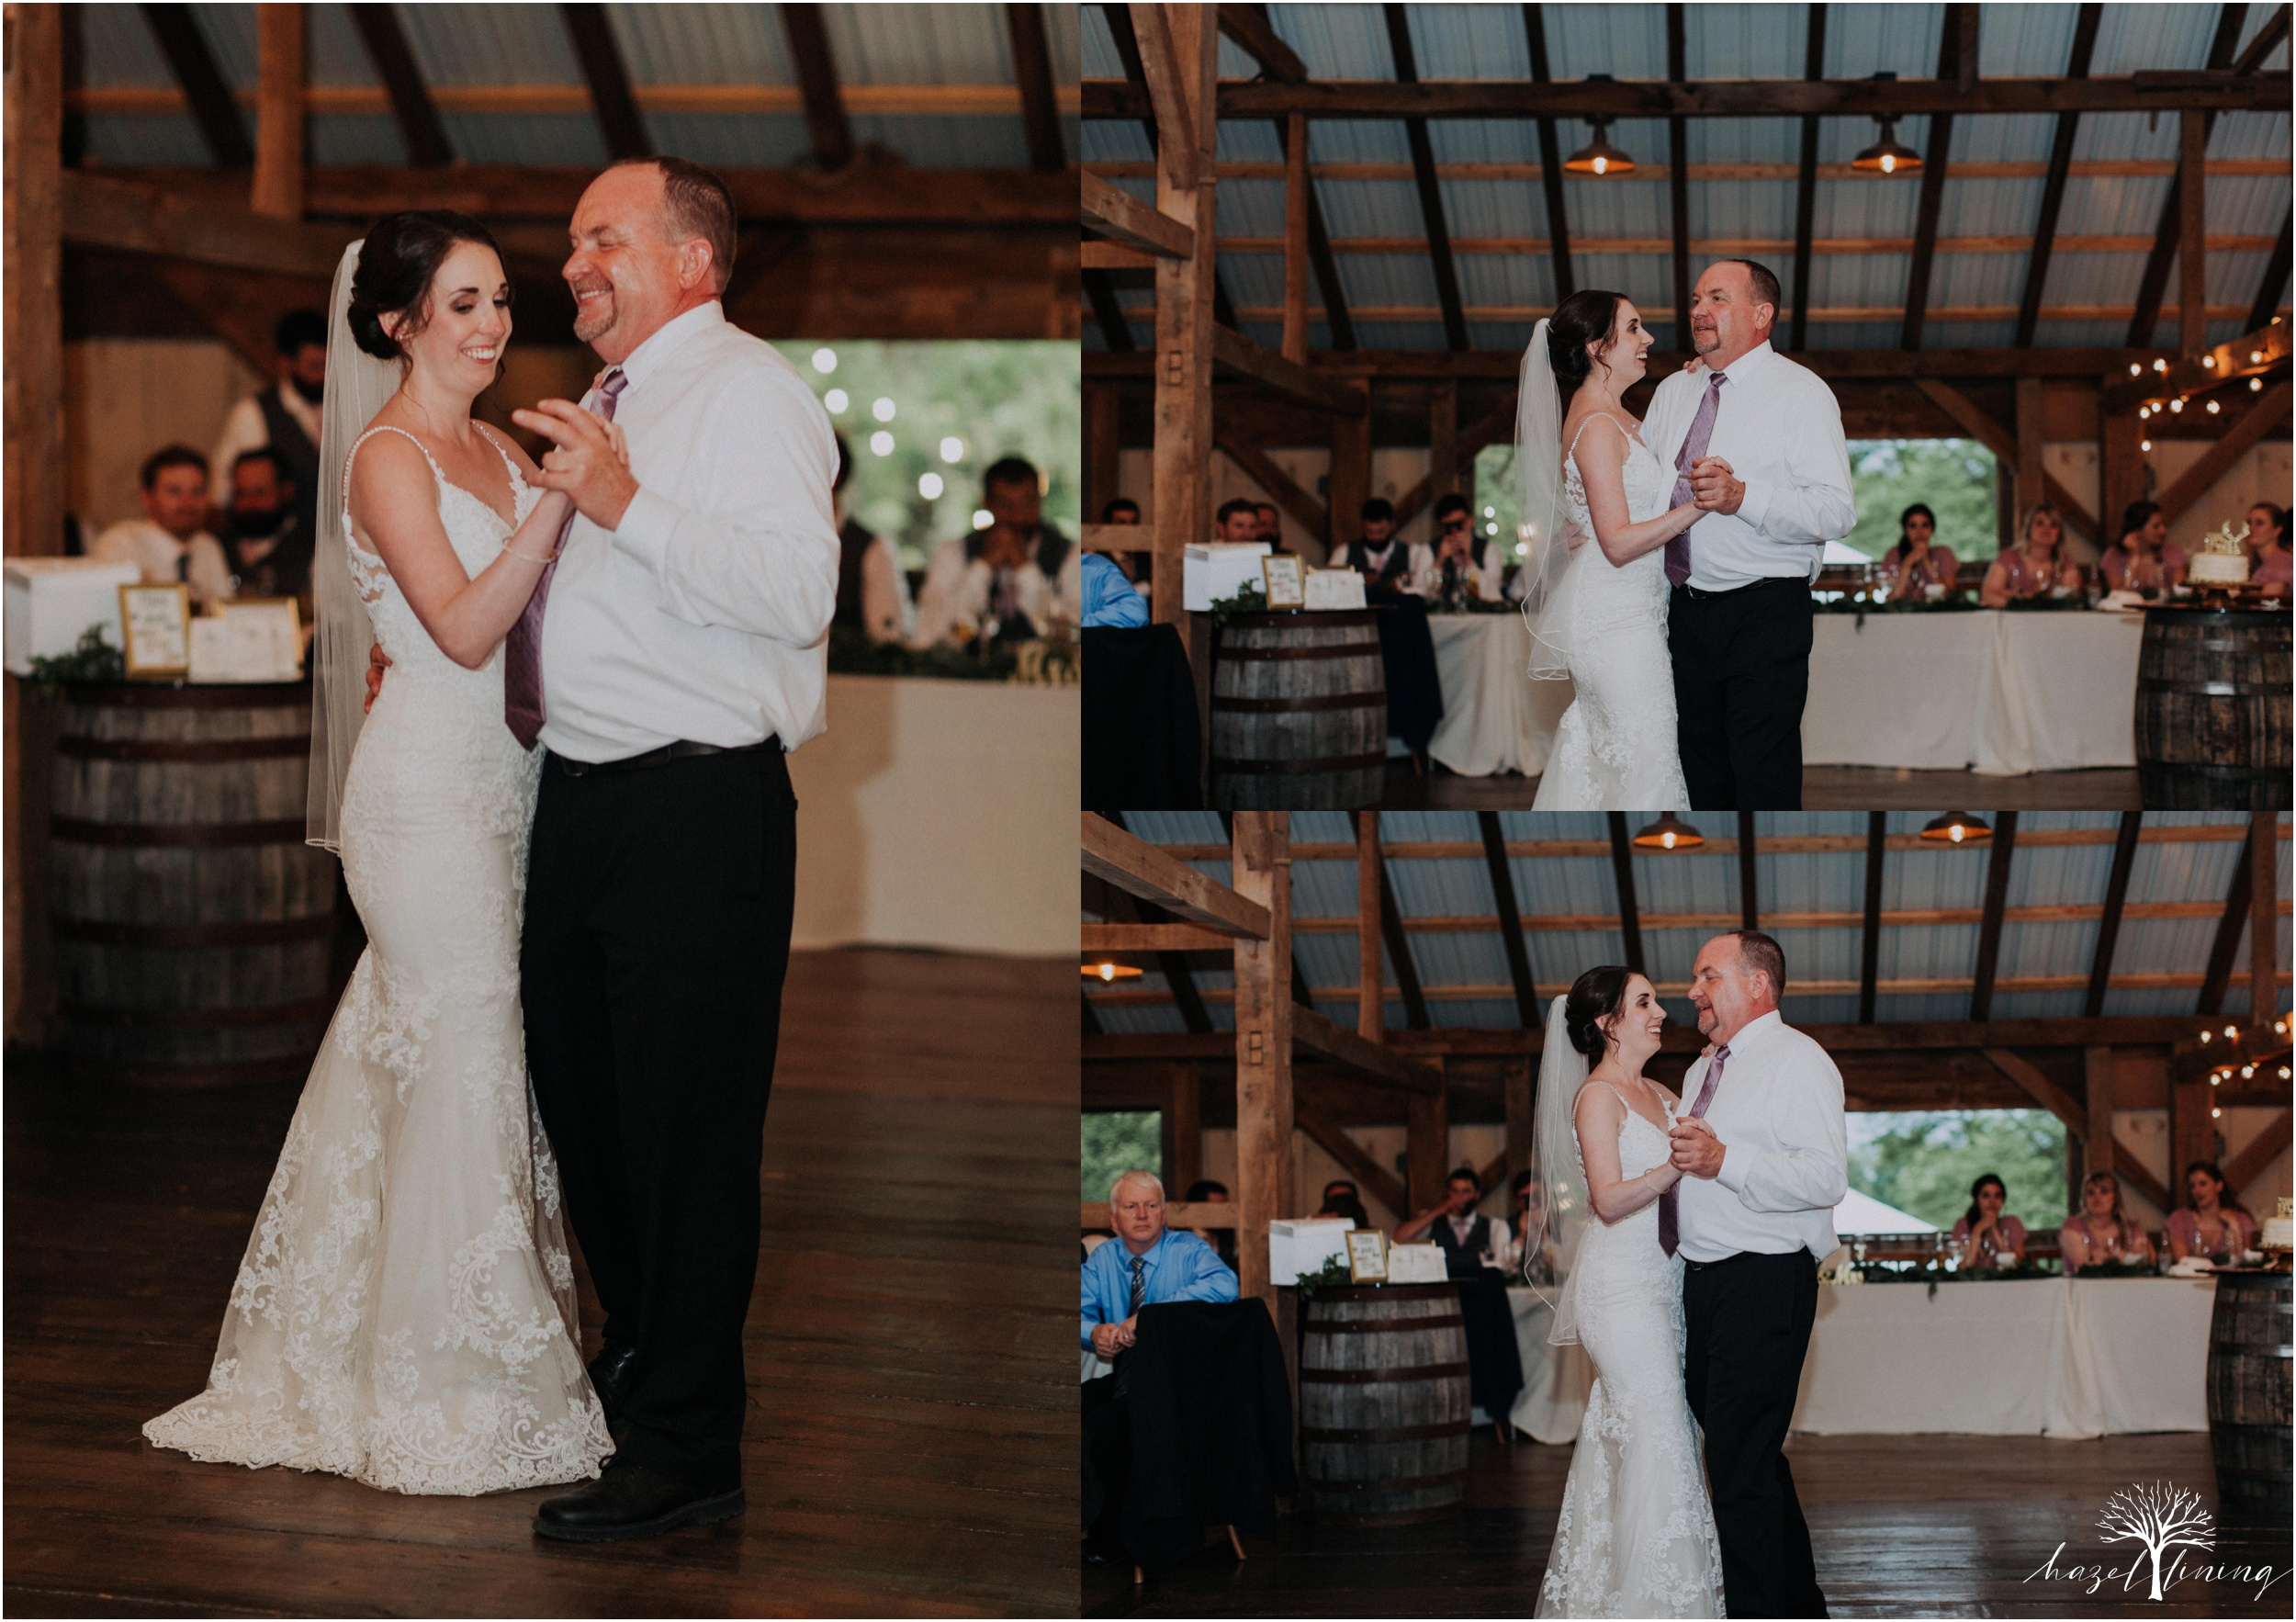 hazel-lining-travel-wedding-elopement-photography-lisa-landon-shoemaker-the-farm-bakery-and-events-bucks-county-quakertown-pennsylvania-summer-country-outdoor-farm-wedding_0129.jpg